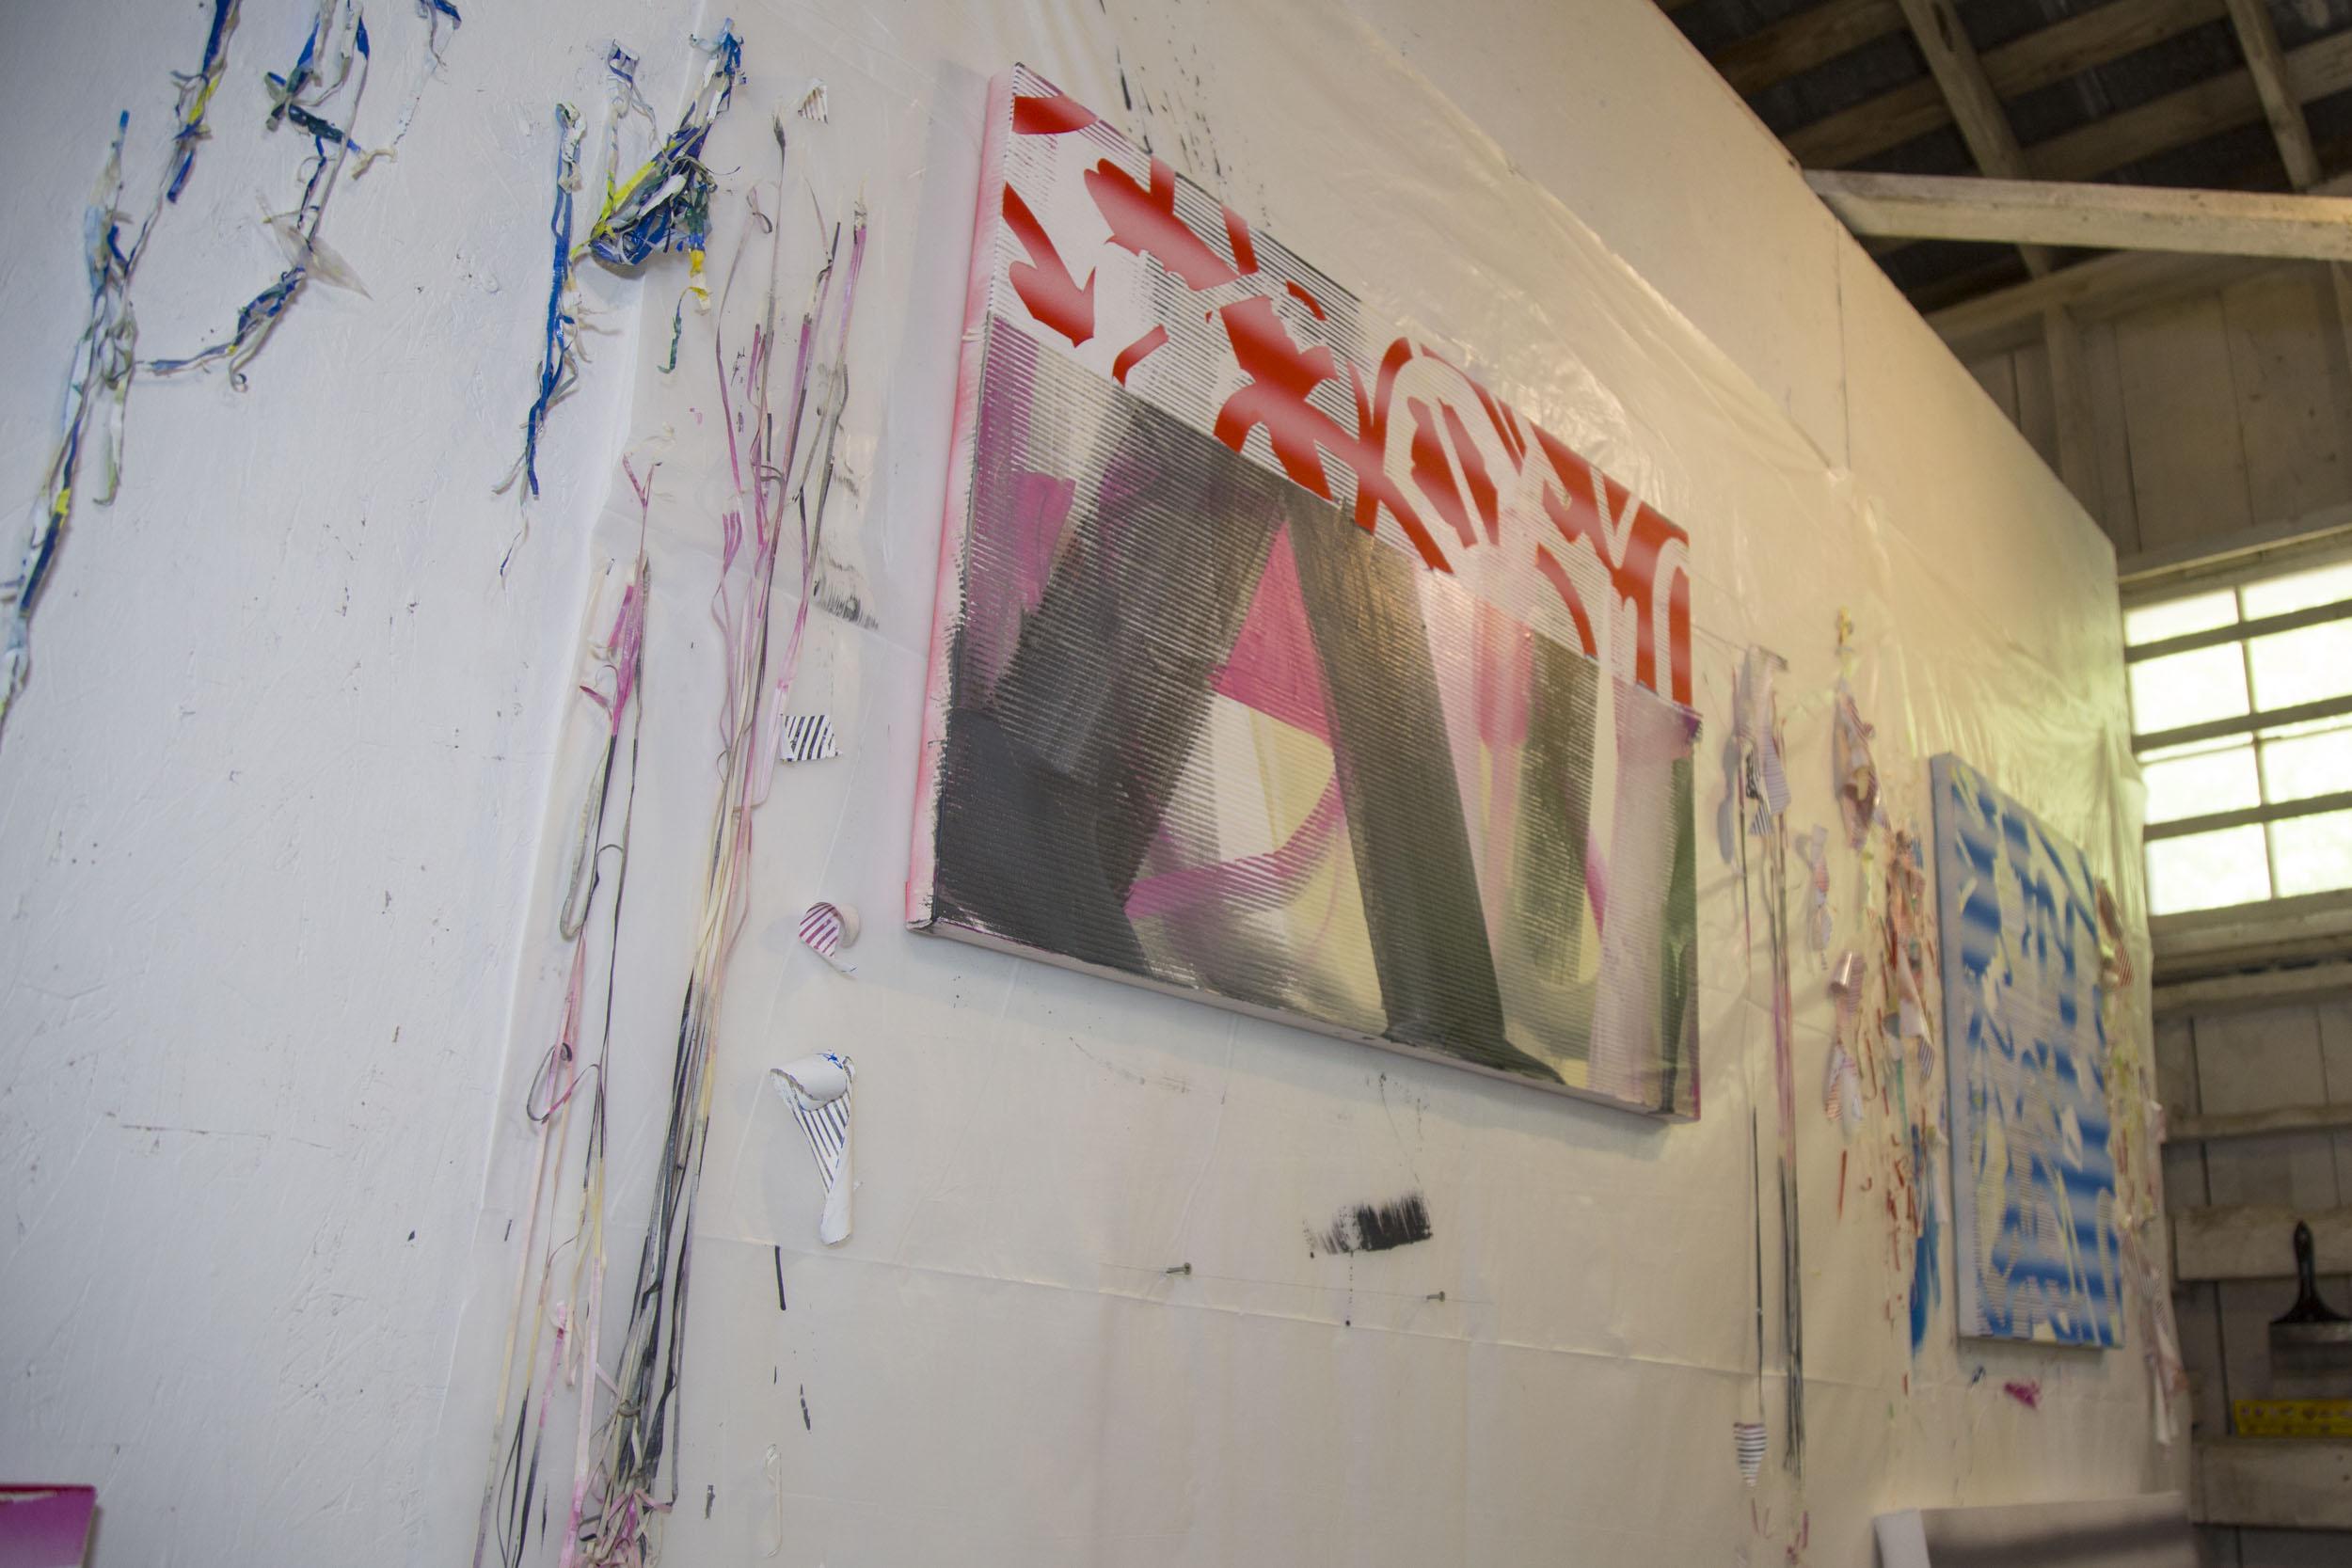 wassaic-project-artist-paolo-arao-2018-06-14-14-20-48.jpg